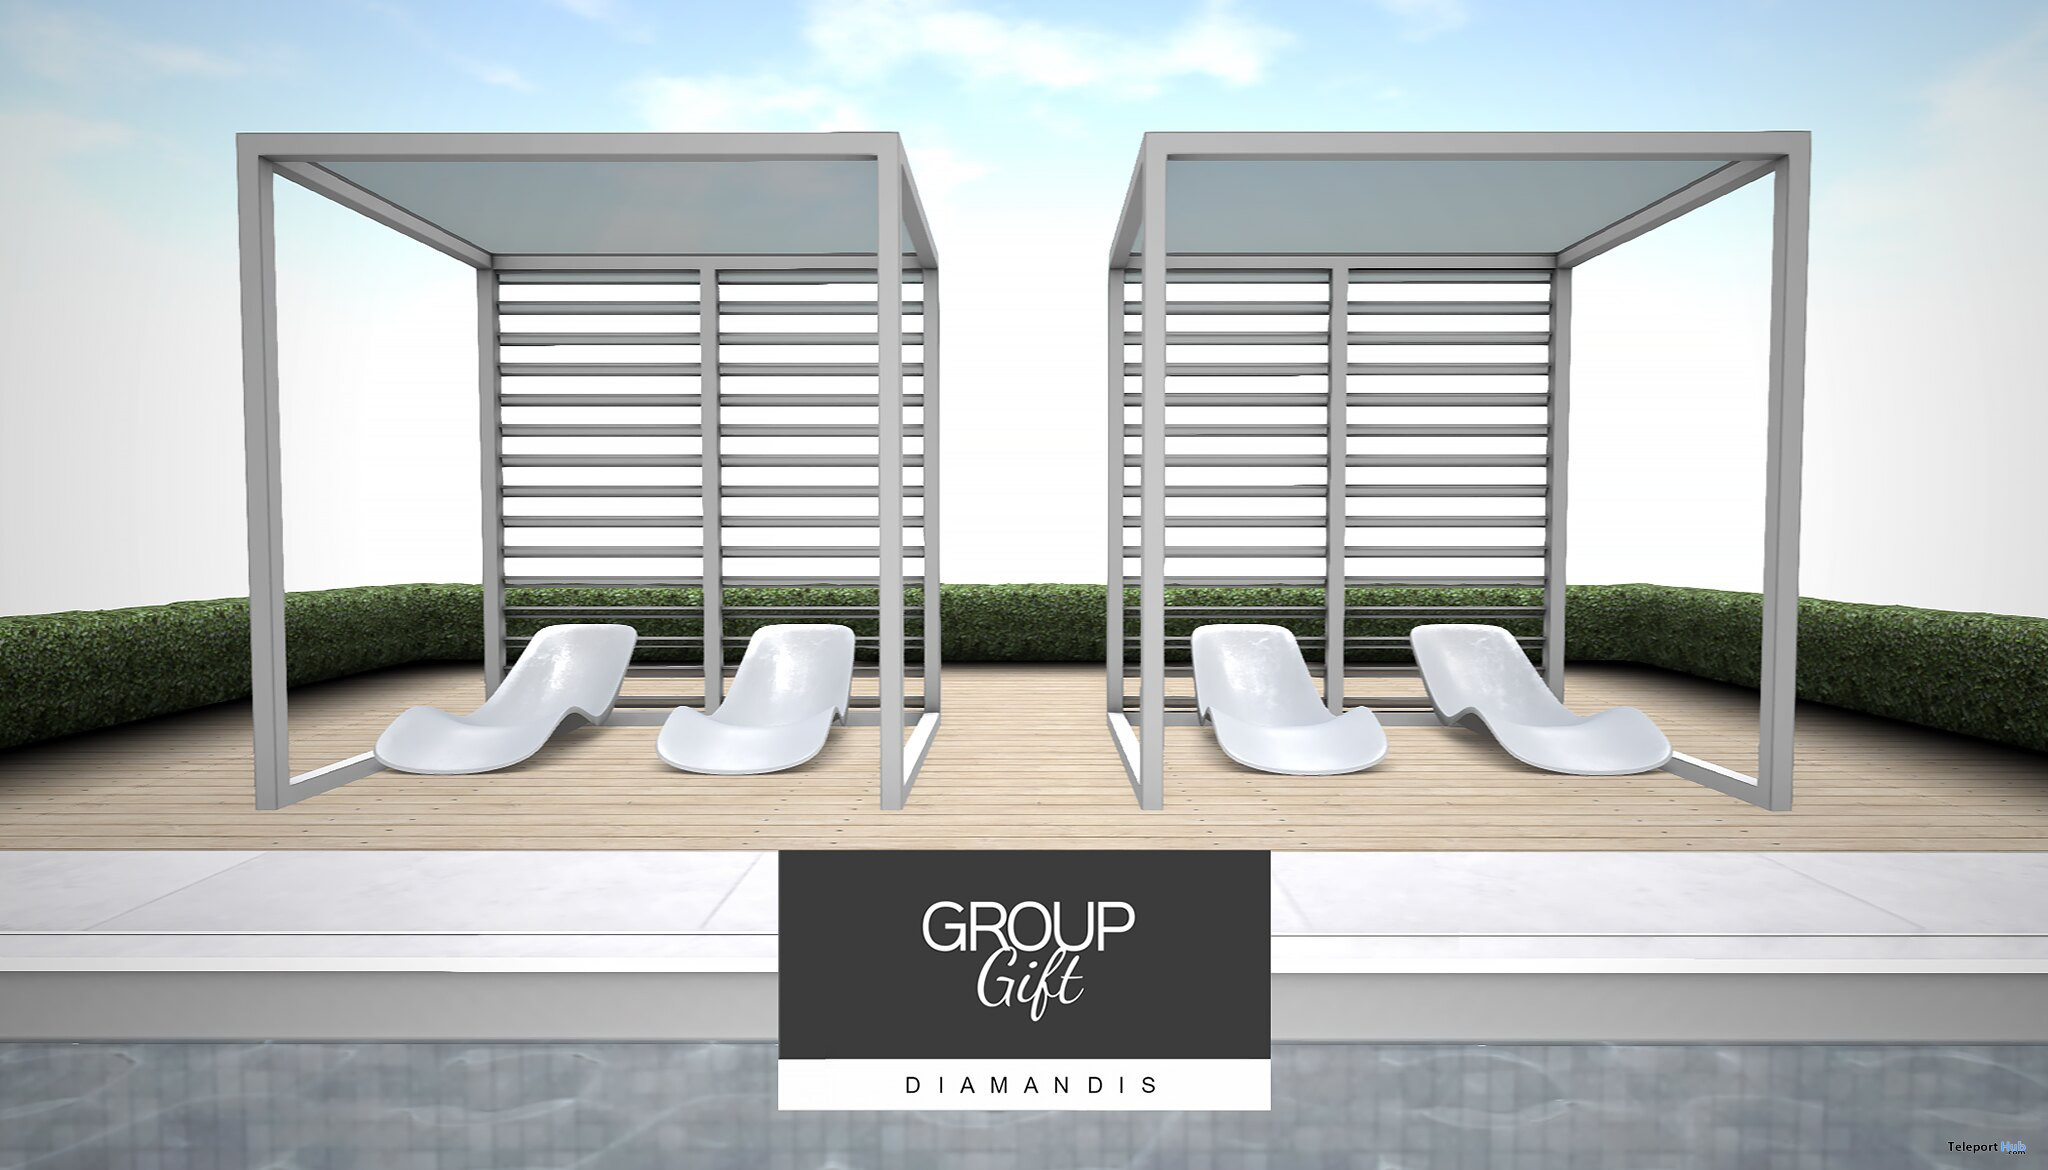 Pool Cabana September 2021 Group Gift by Diamandis - Teleport Hub - teleporthub.com